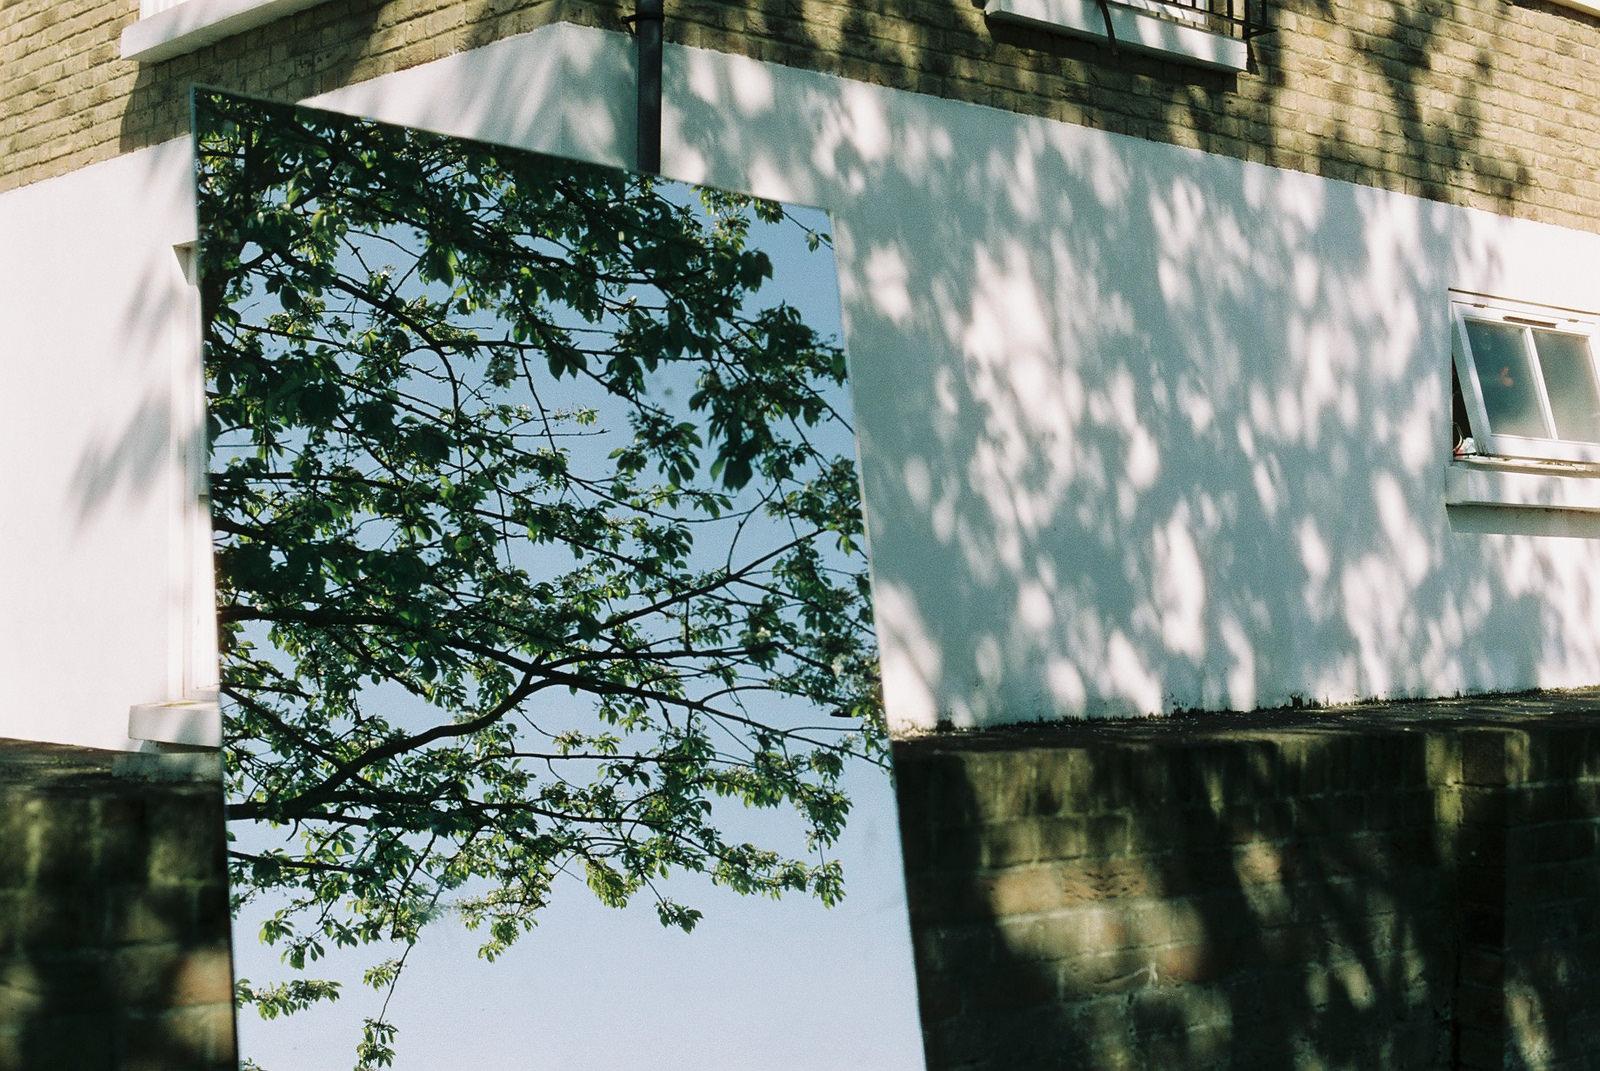 Mirror garden, SE20